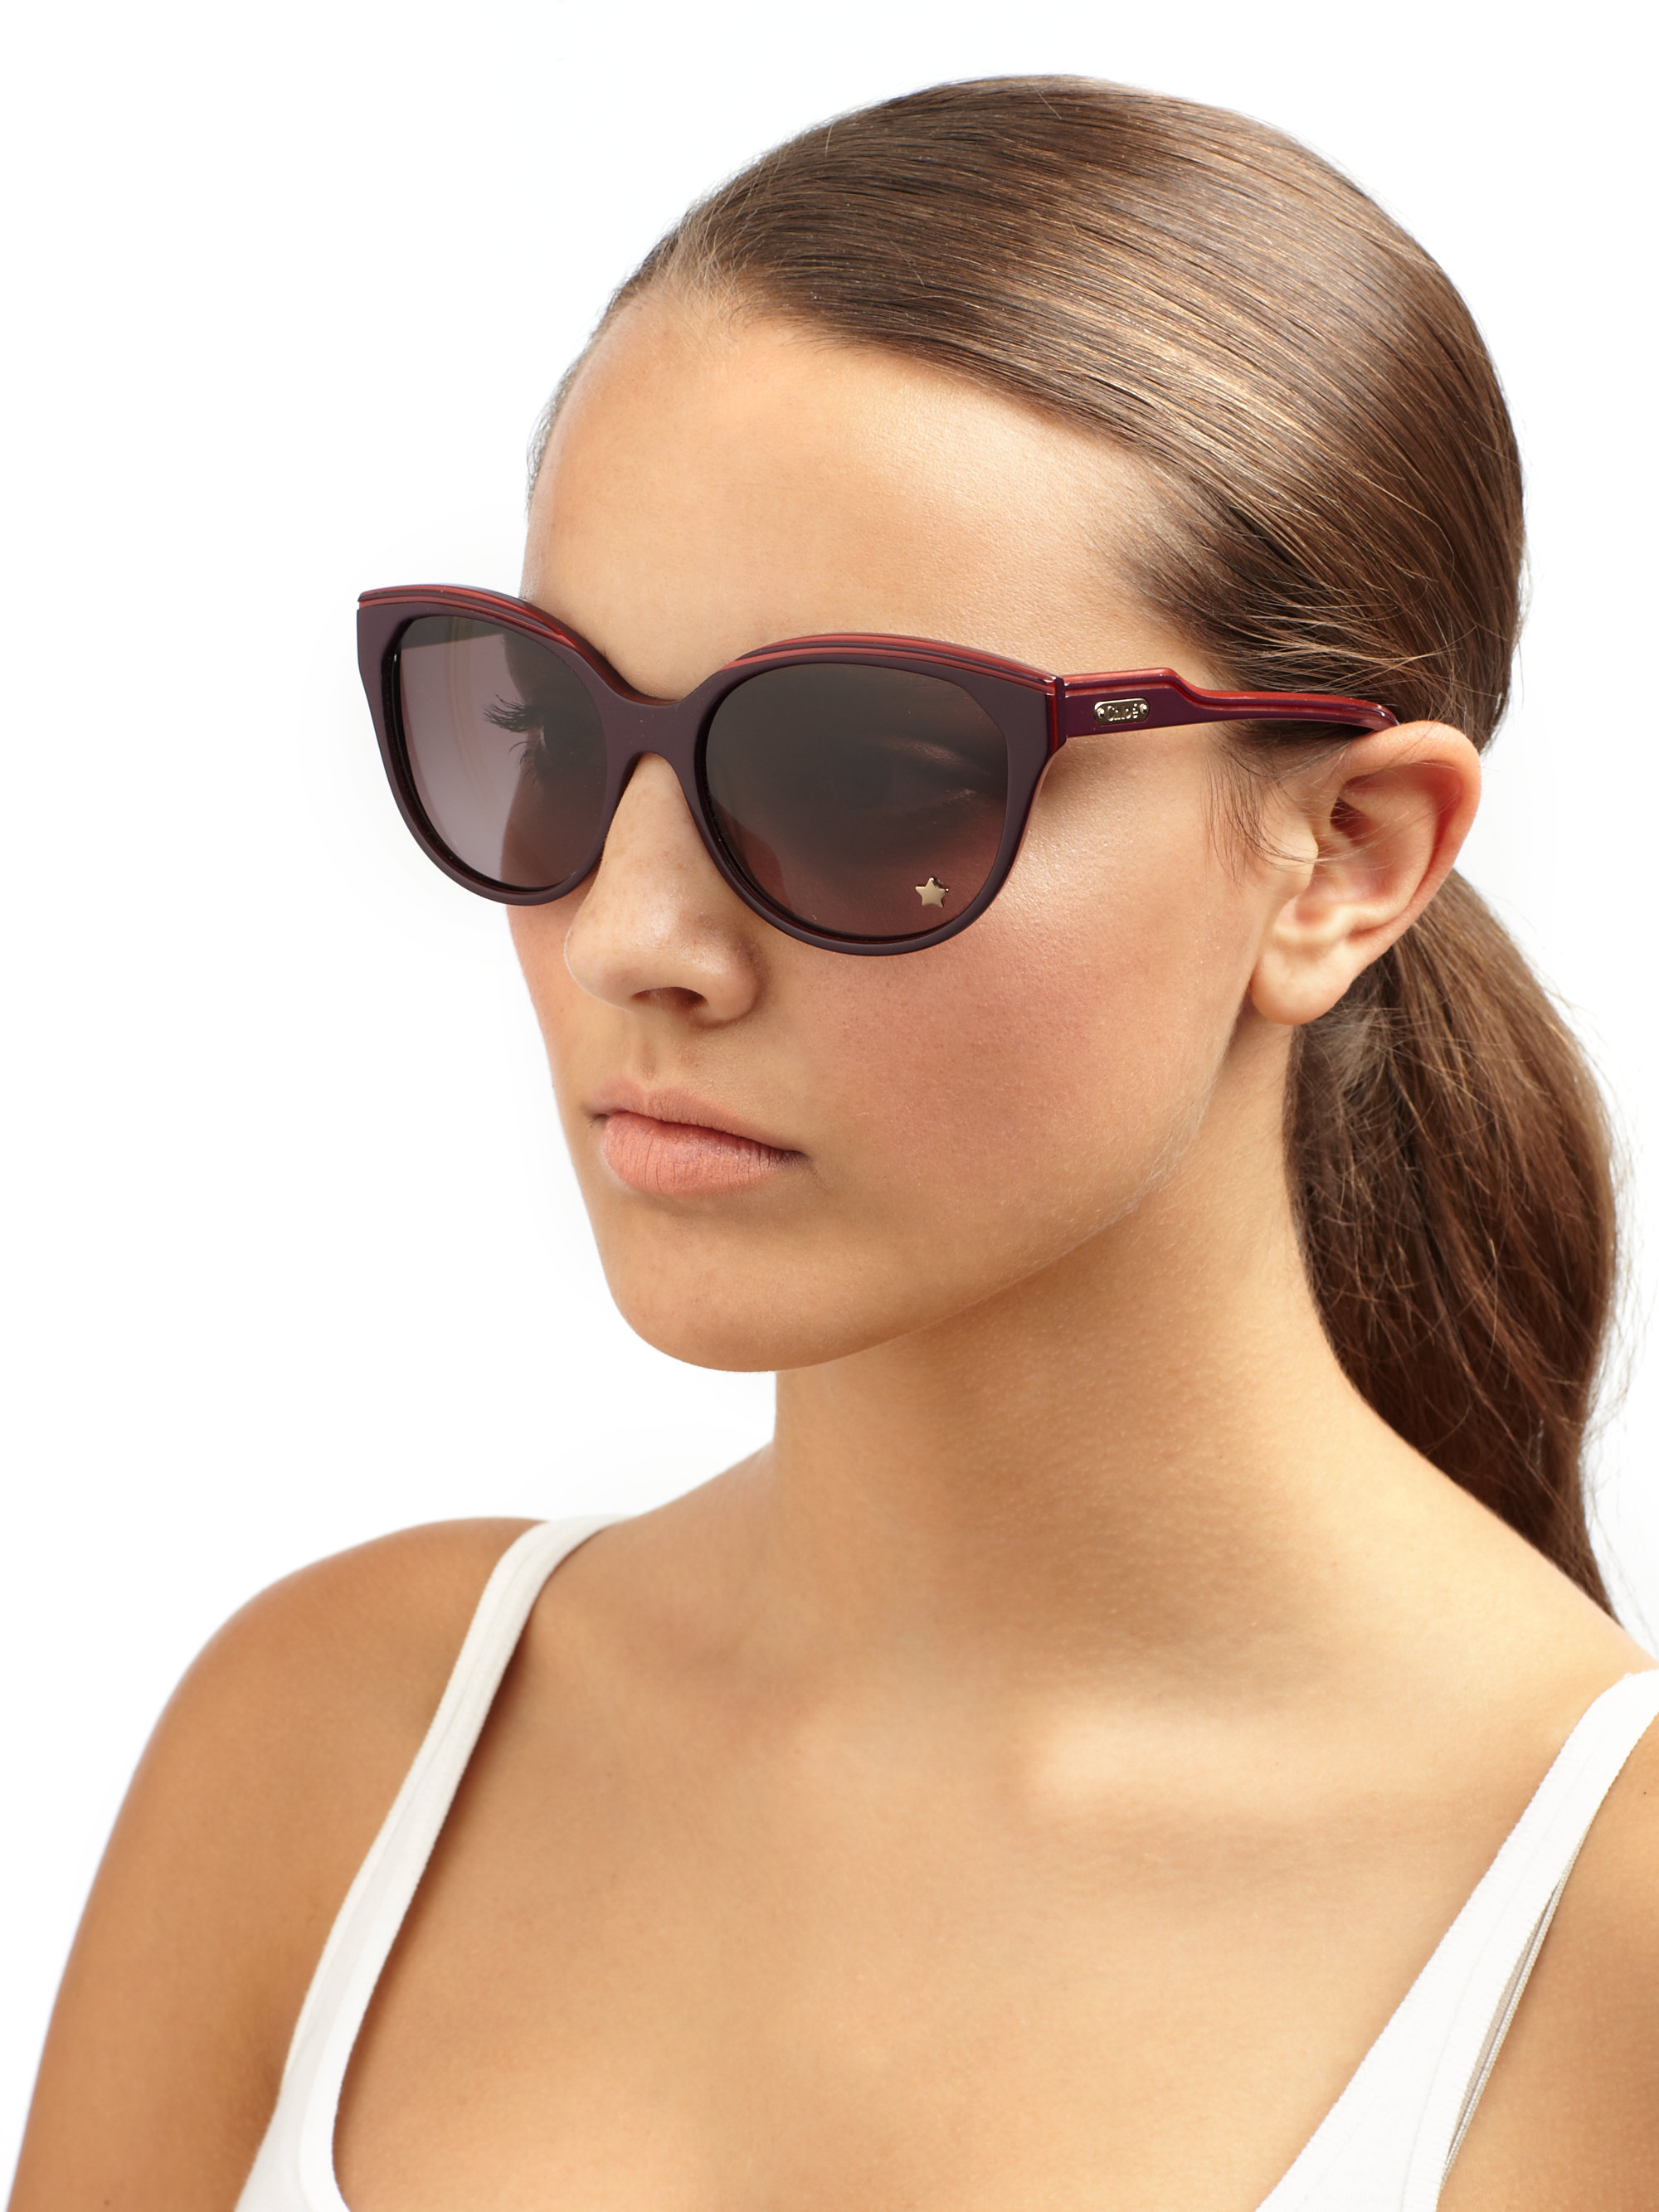 chloe sunglasses g8im  Gallery